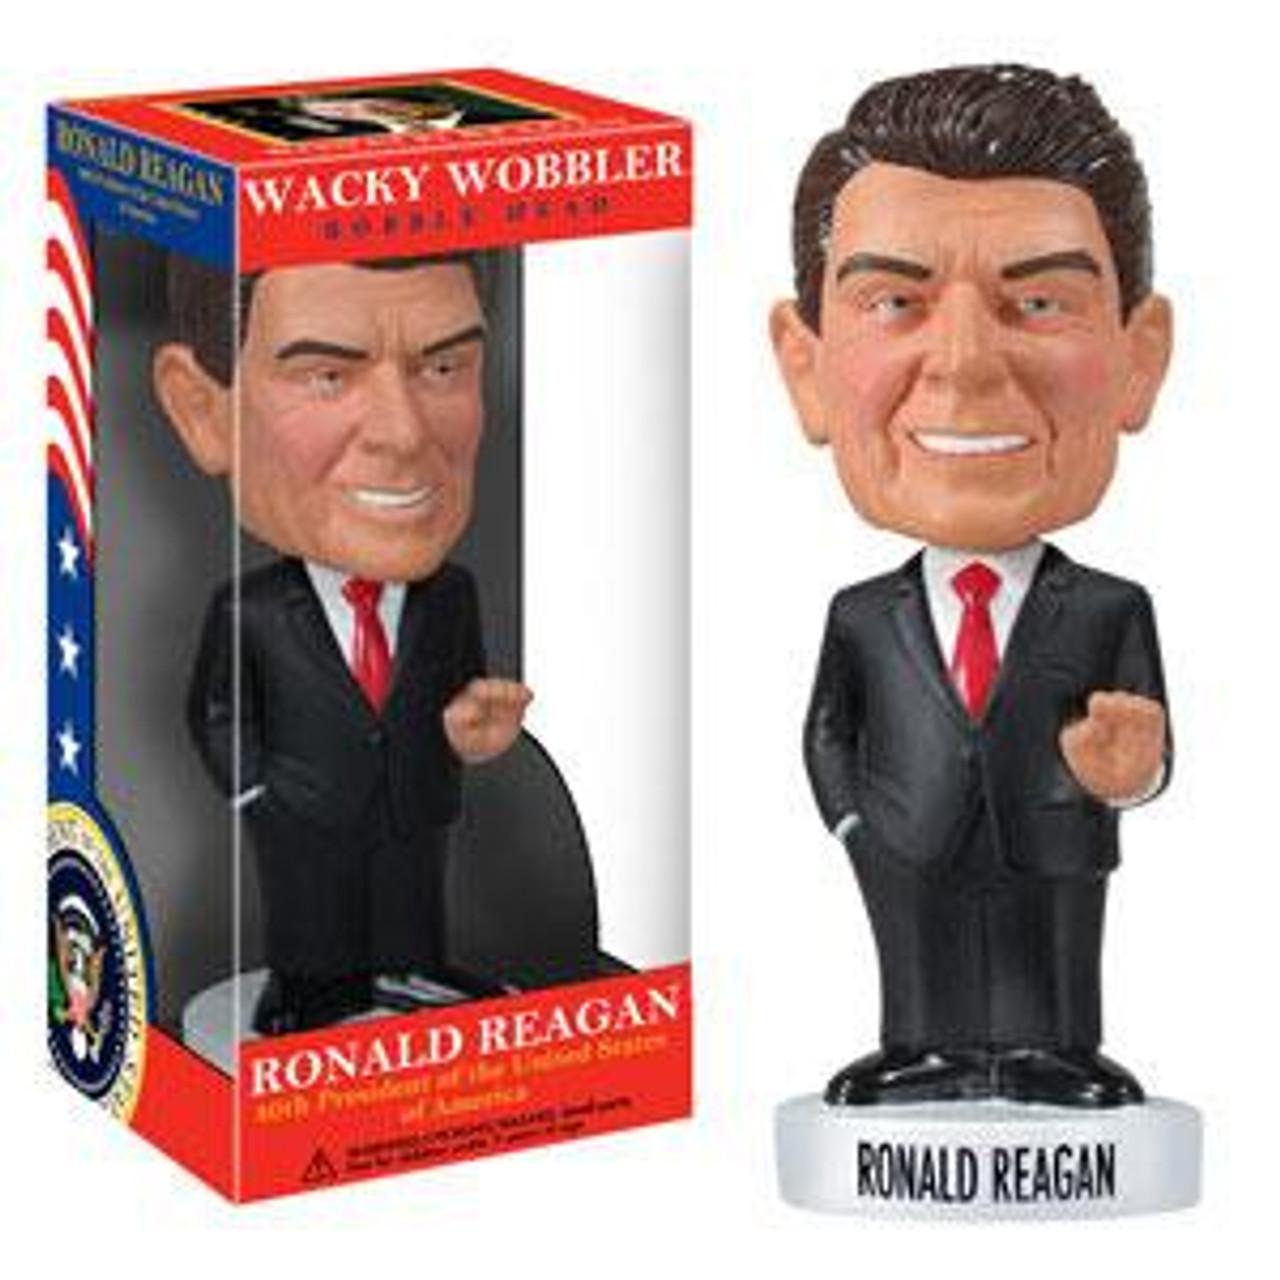 Funko Wacky Wobbler President Ronald Reagan Bobble Head